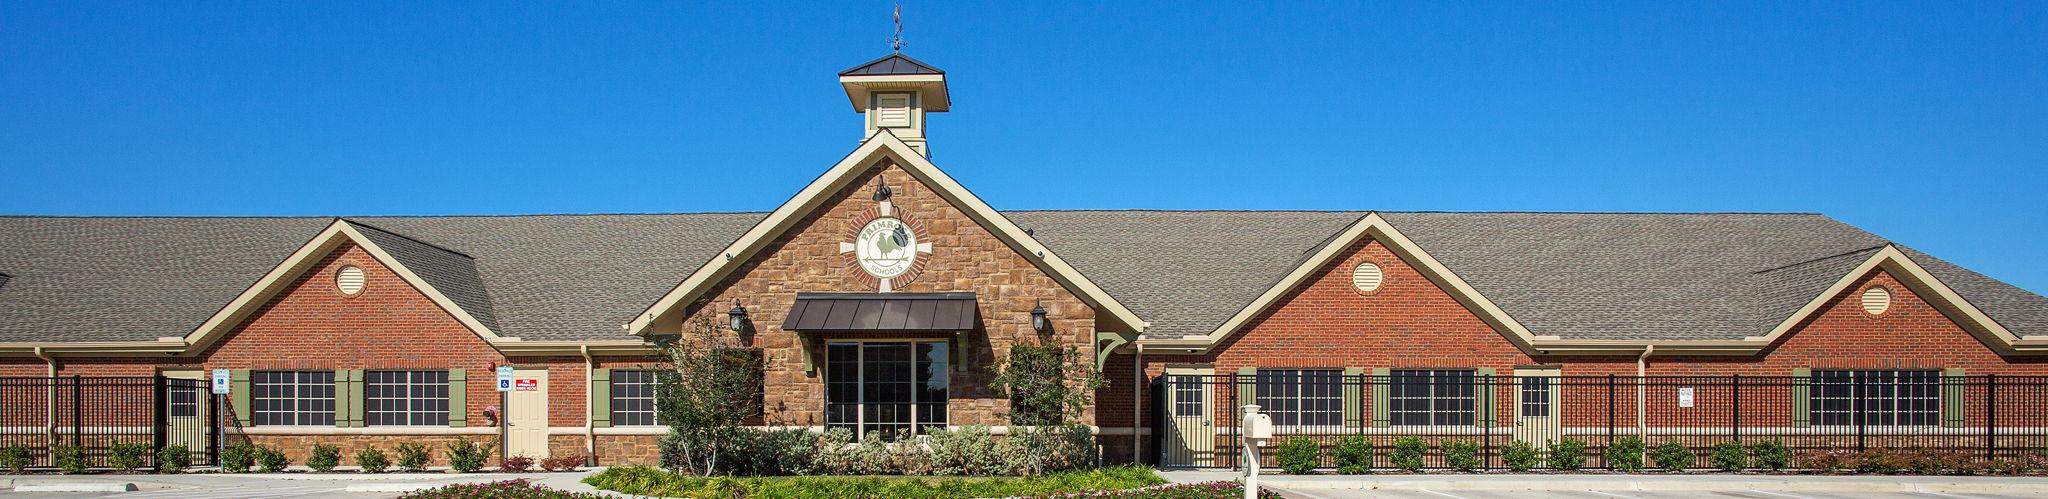 image of Primrose School of Southwest Arlington exterior